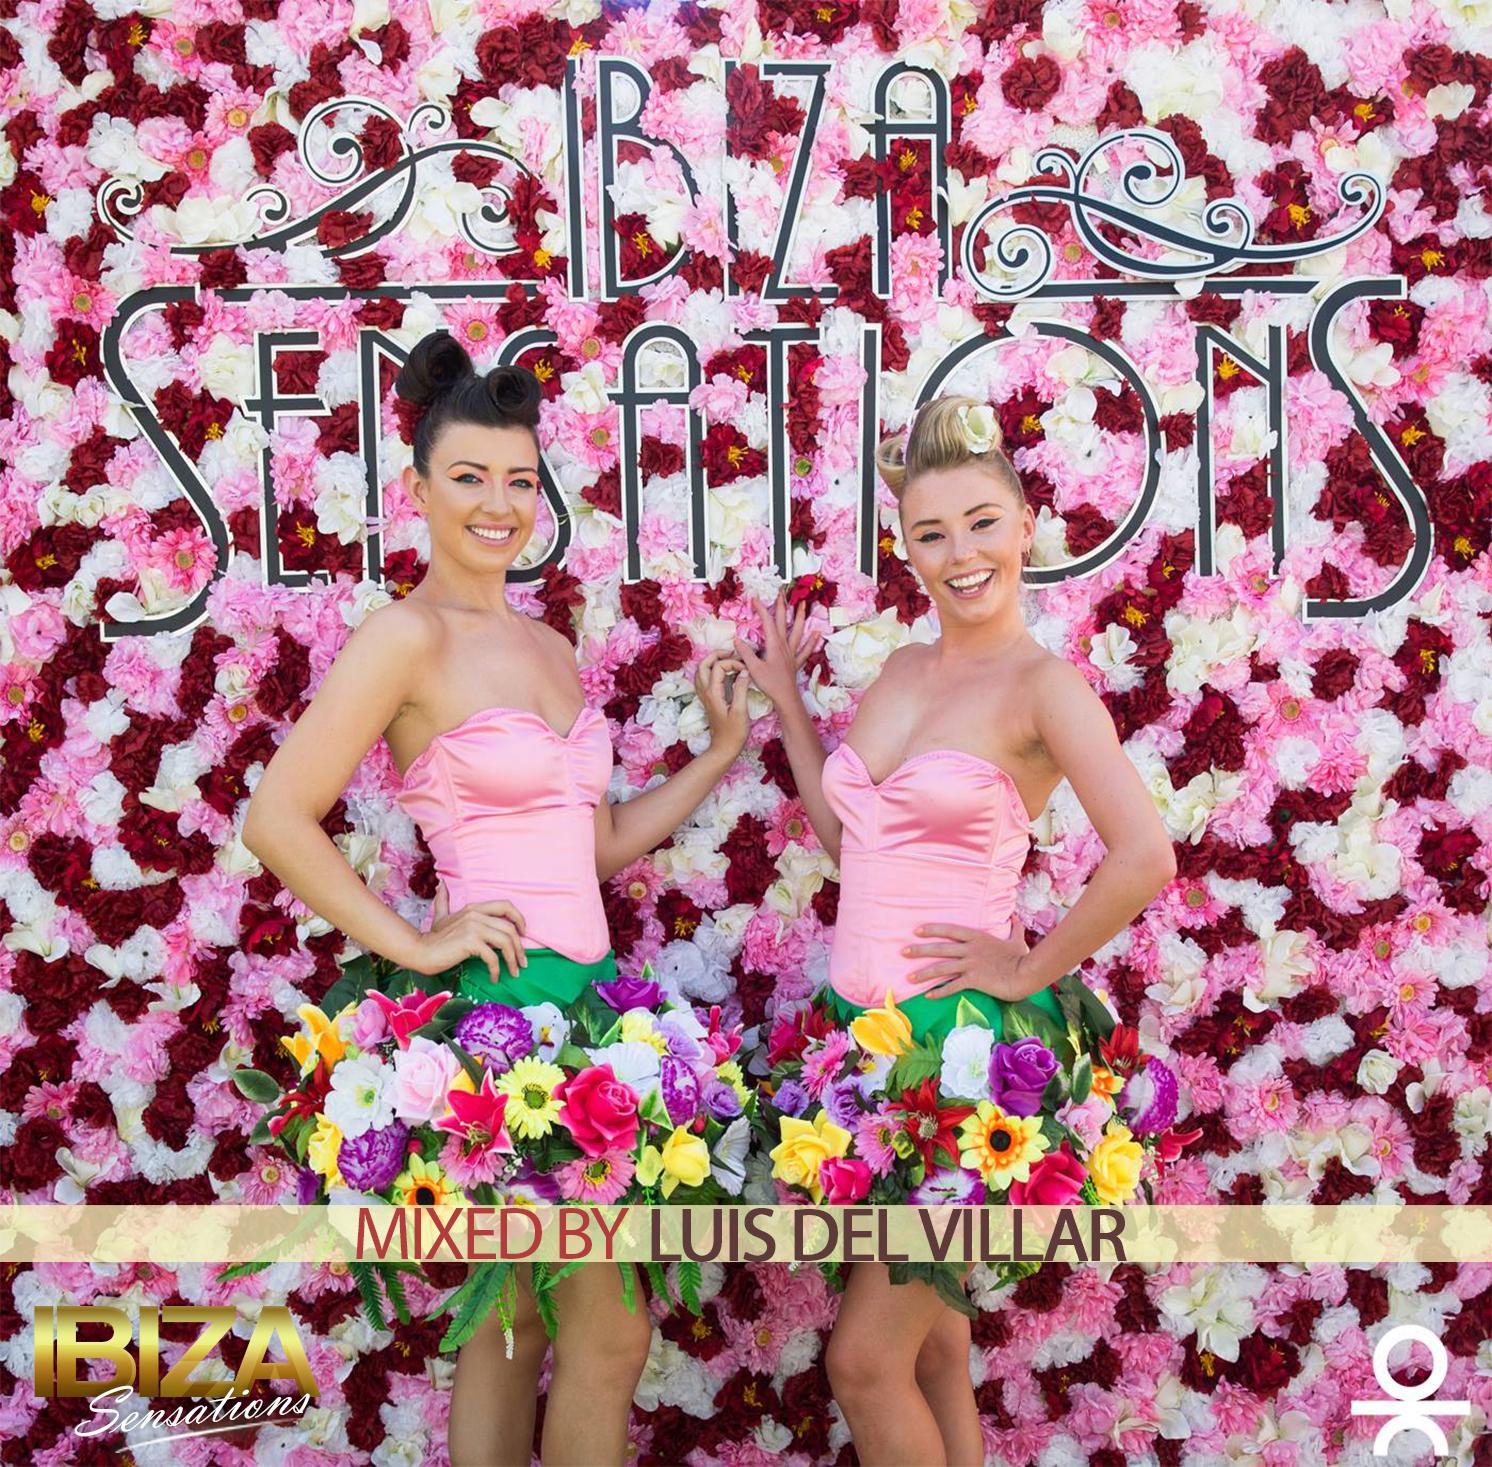 Ibiza Sensations 135 @ Ocean Beach Ibiza Summer 2016 Every wednesday from 8 june - 28 sept.